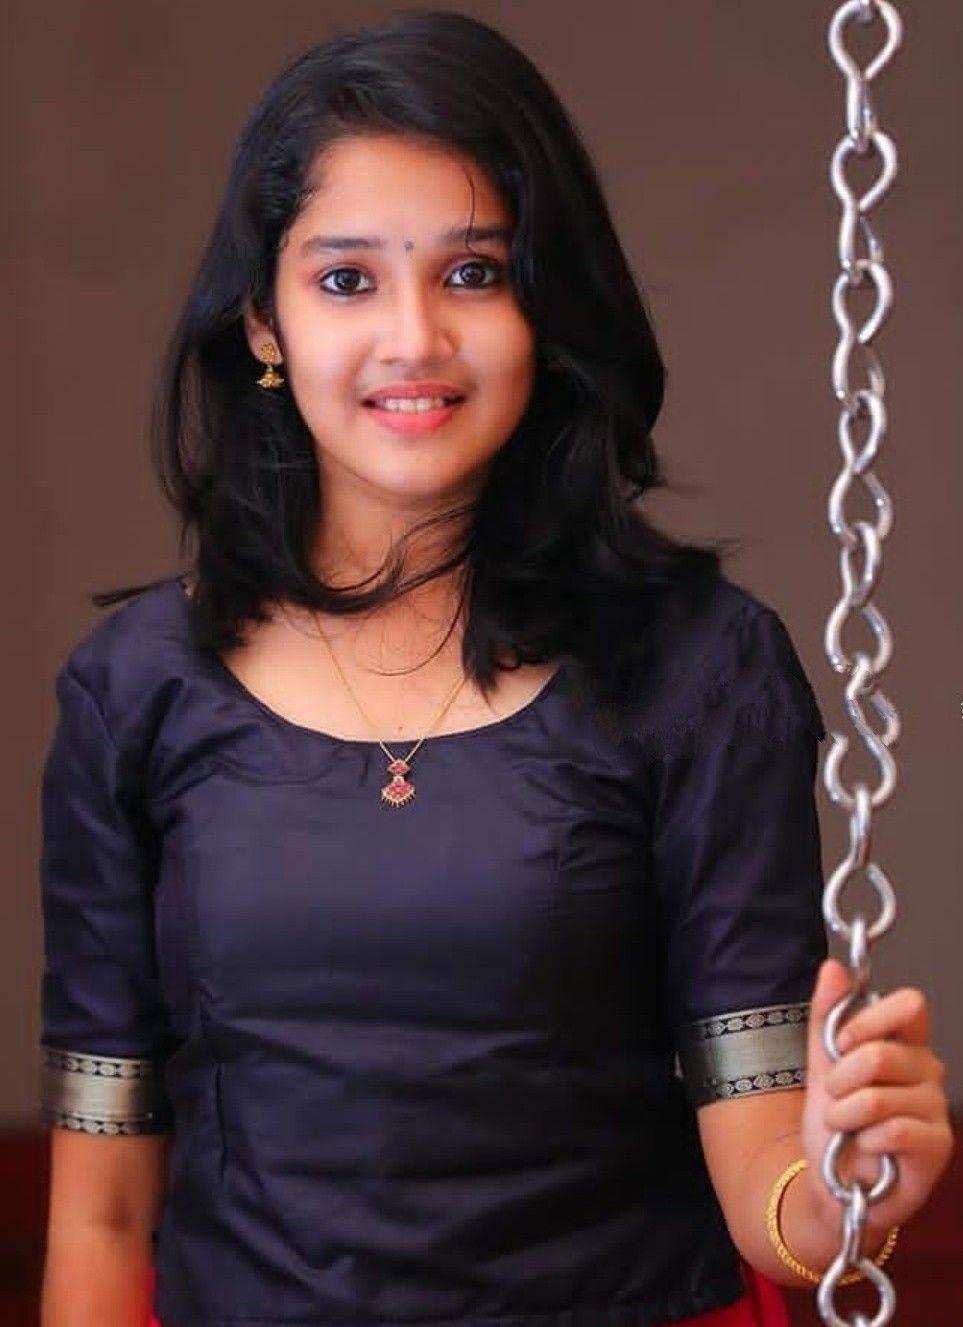 Cute South Indian Teenager Shruti Hasan Indian Teen Child Actresses Indian Models